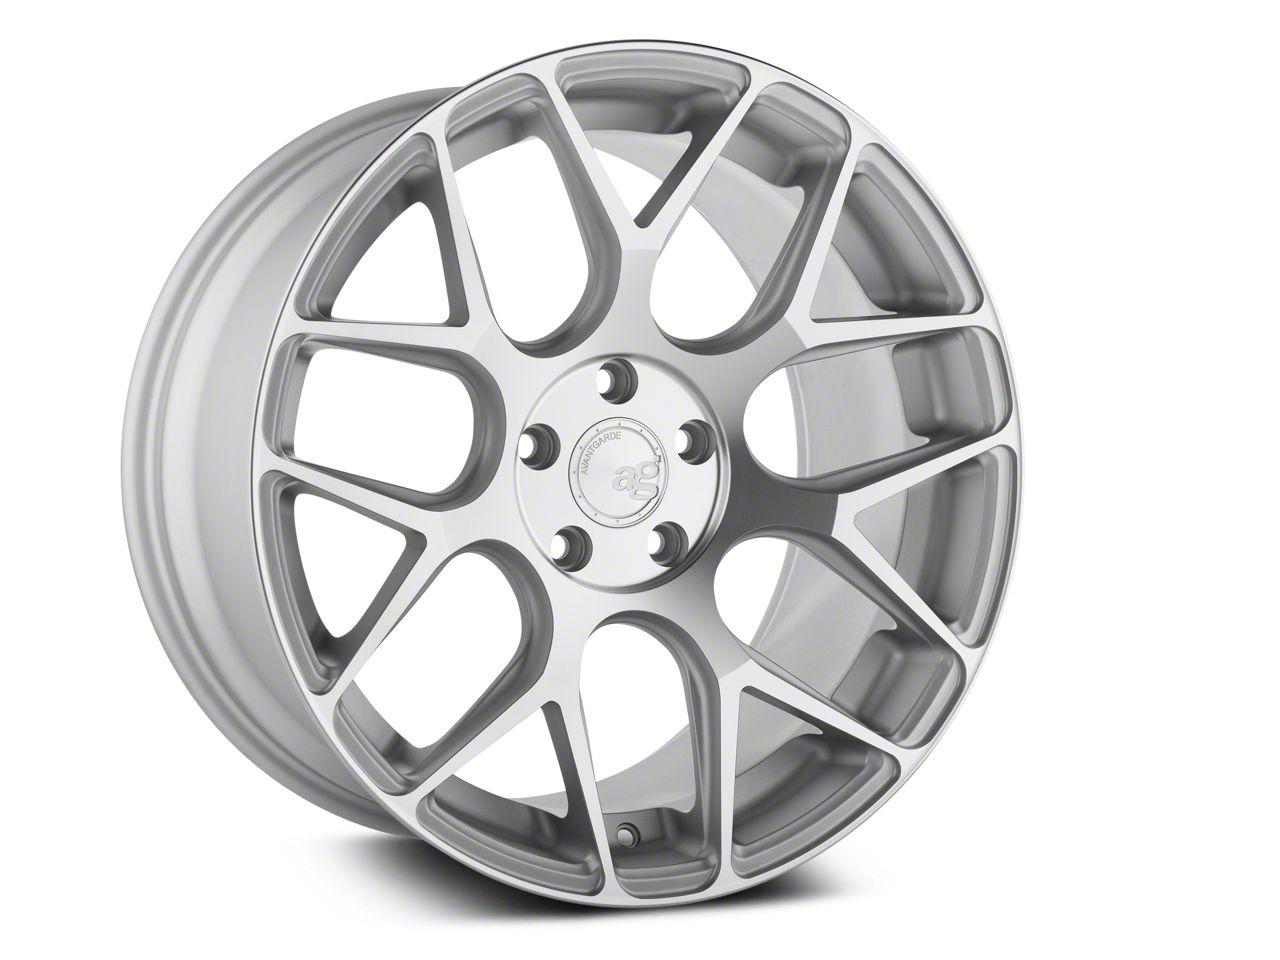 Avant Garde M590 Satin Silver Wheel - 20x10 - Rear Only (15-19 All)